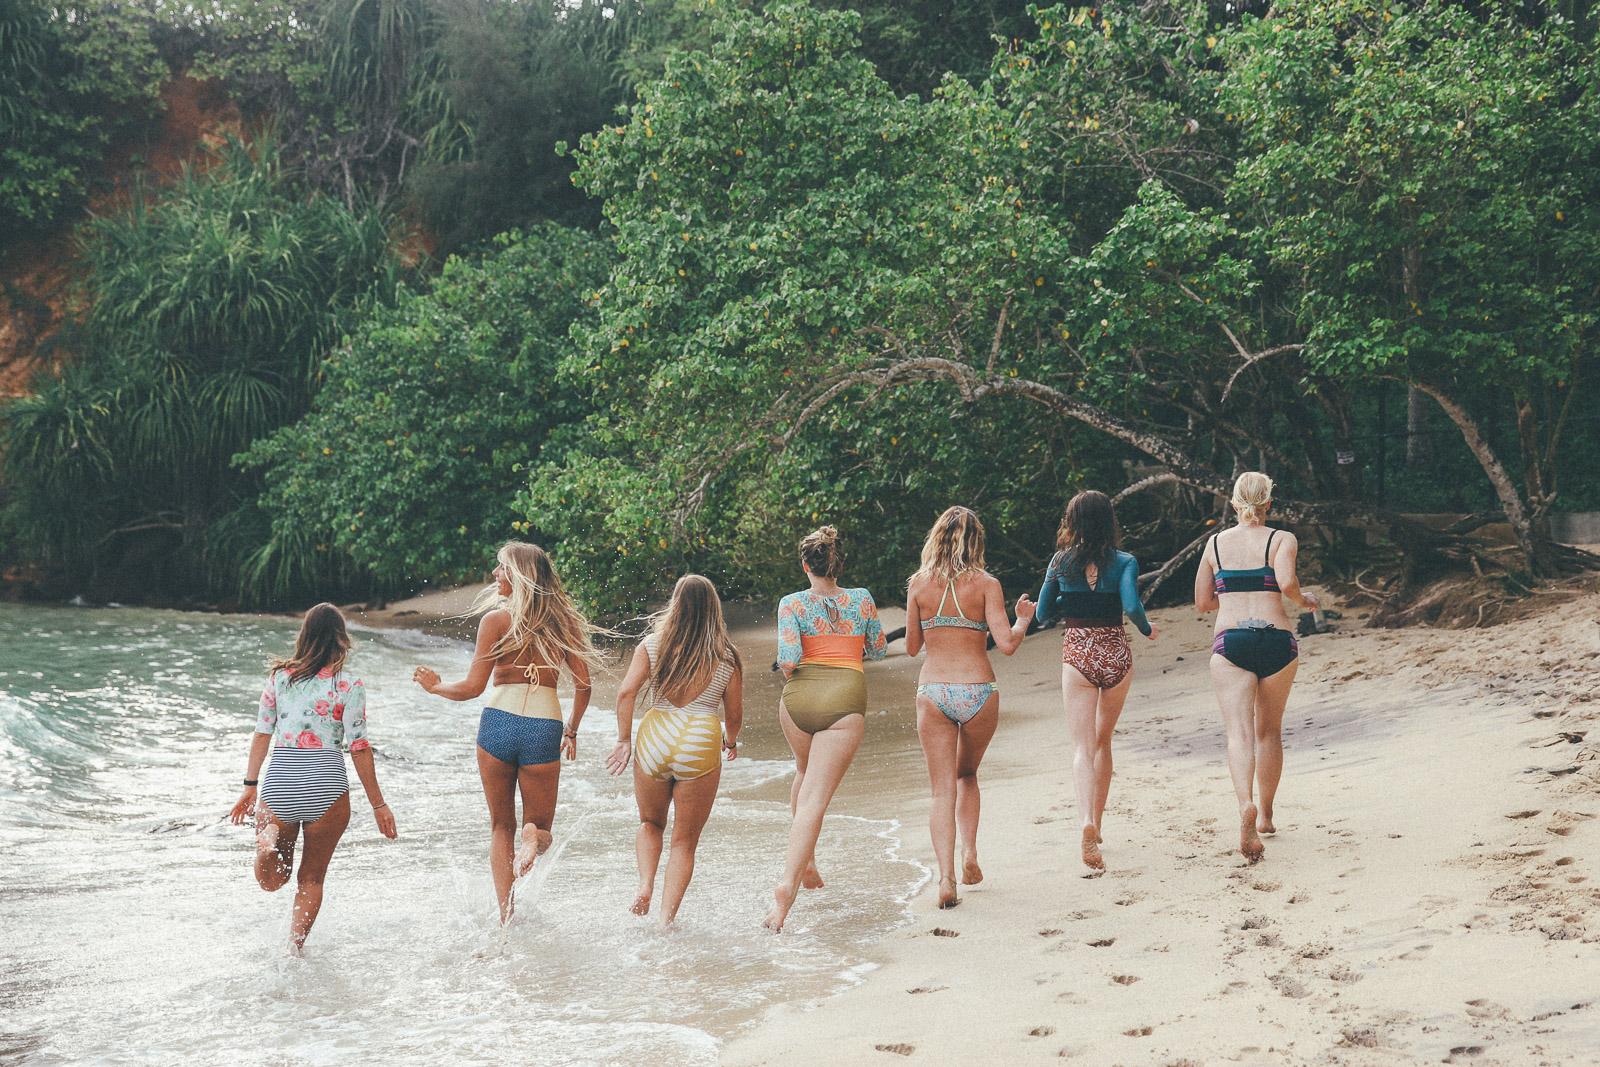 sunshinestories-surf-travel-blog-img_0406